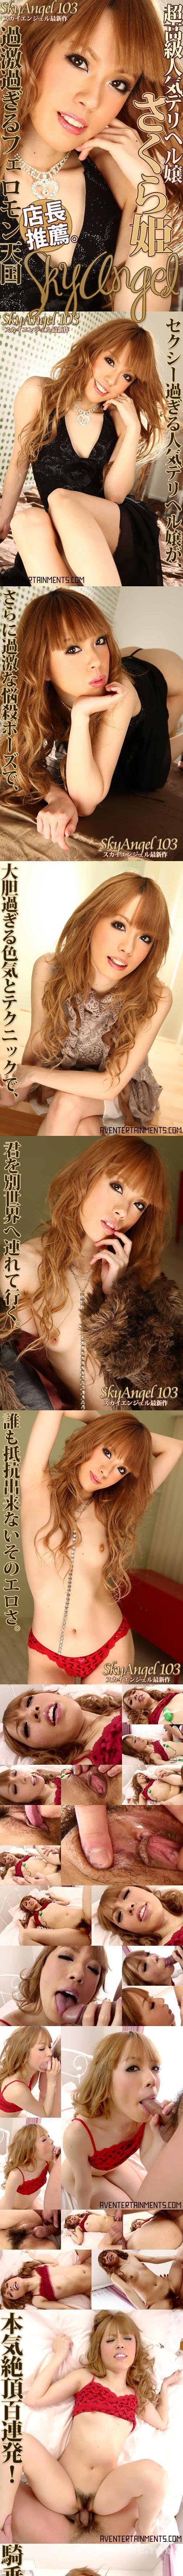 [SKY-153] スカイエンジェル Vol.103 : さくら姫